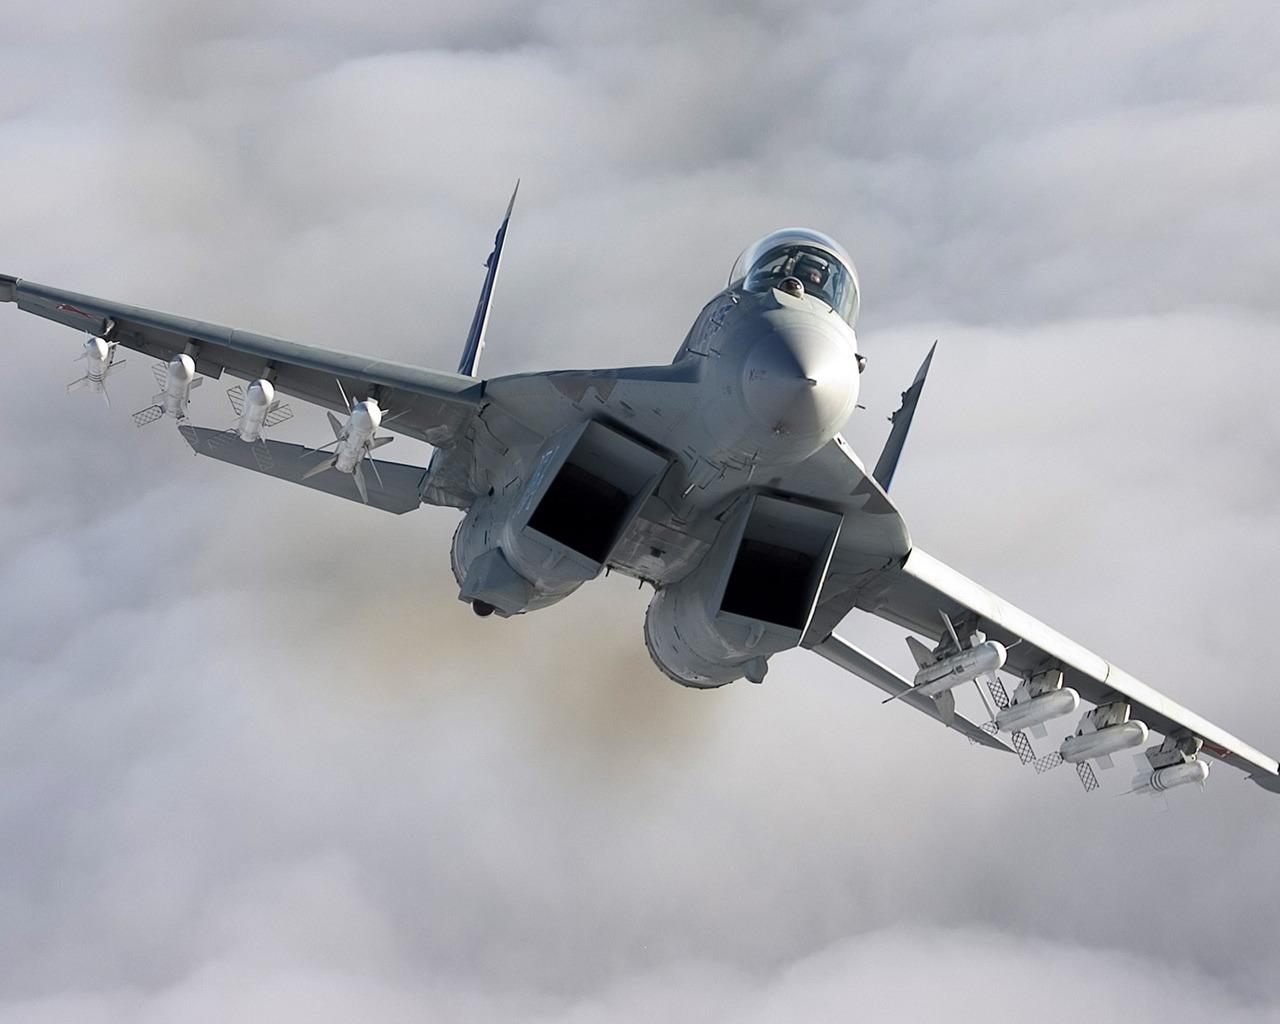 ��G�f�_美海军为节约成本启动f/a-18战斗机延寿计划